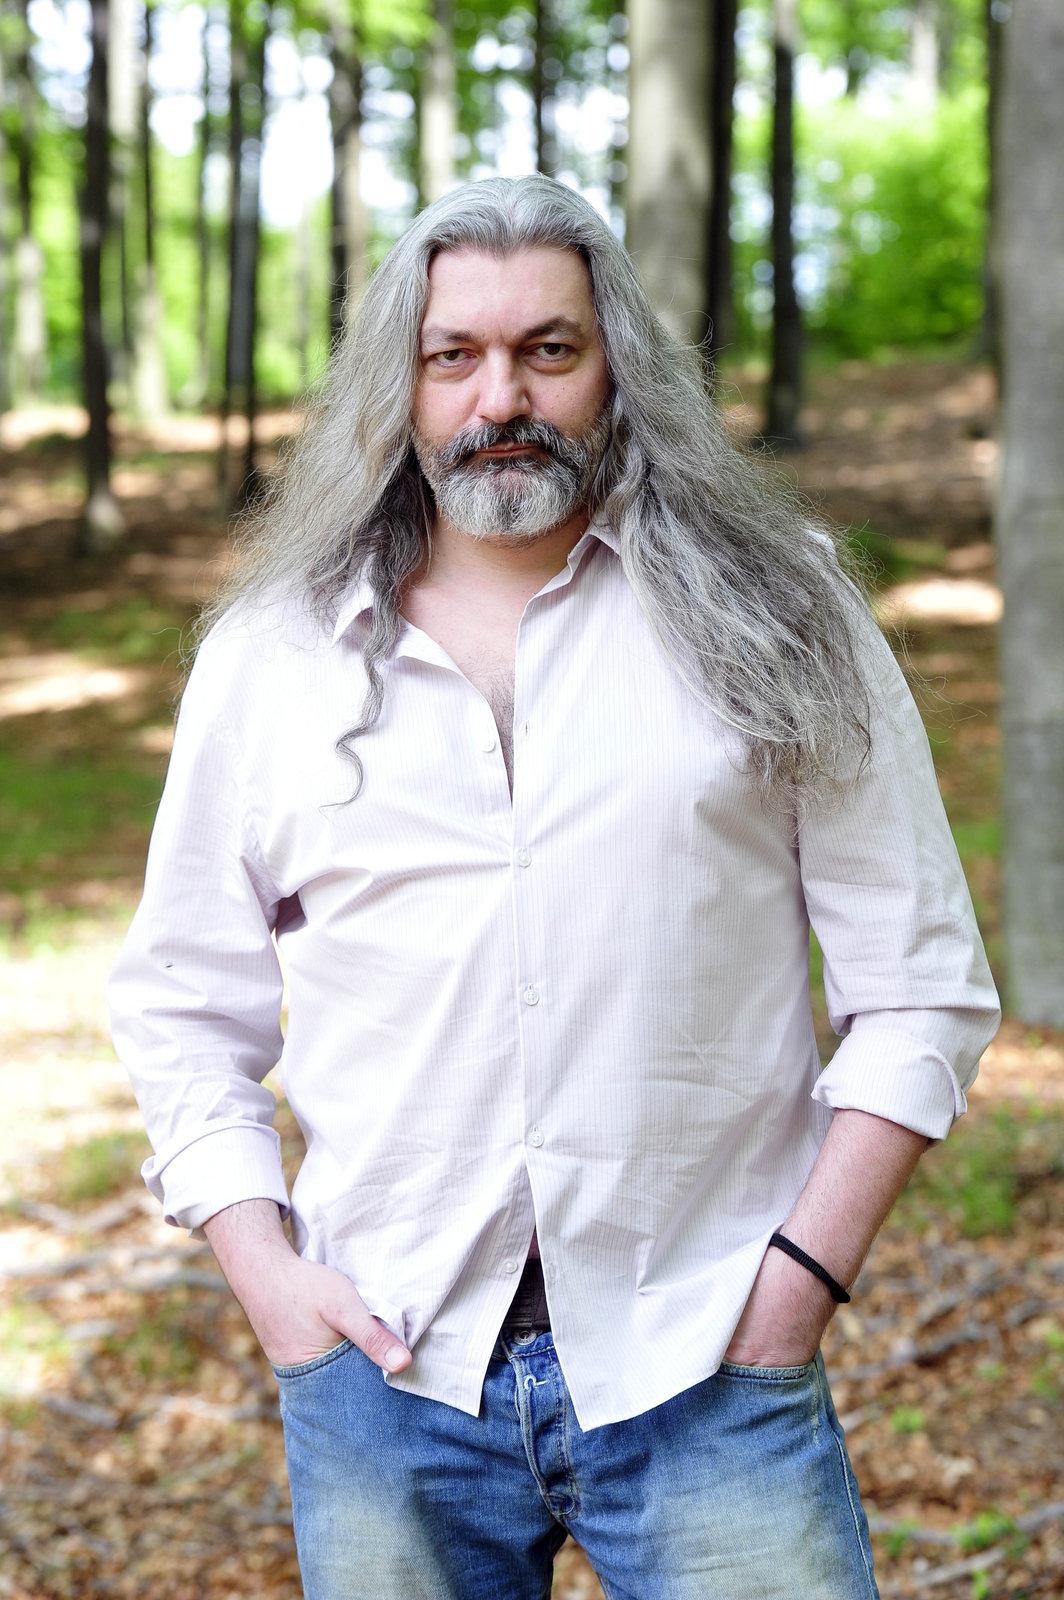 Dan Hůlka